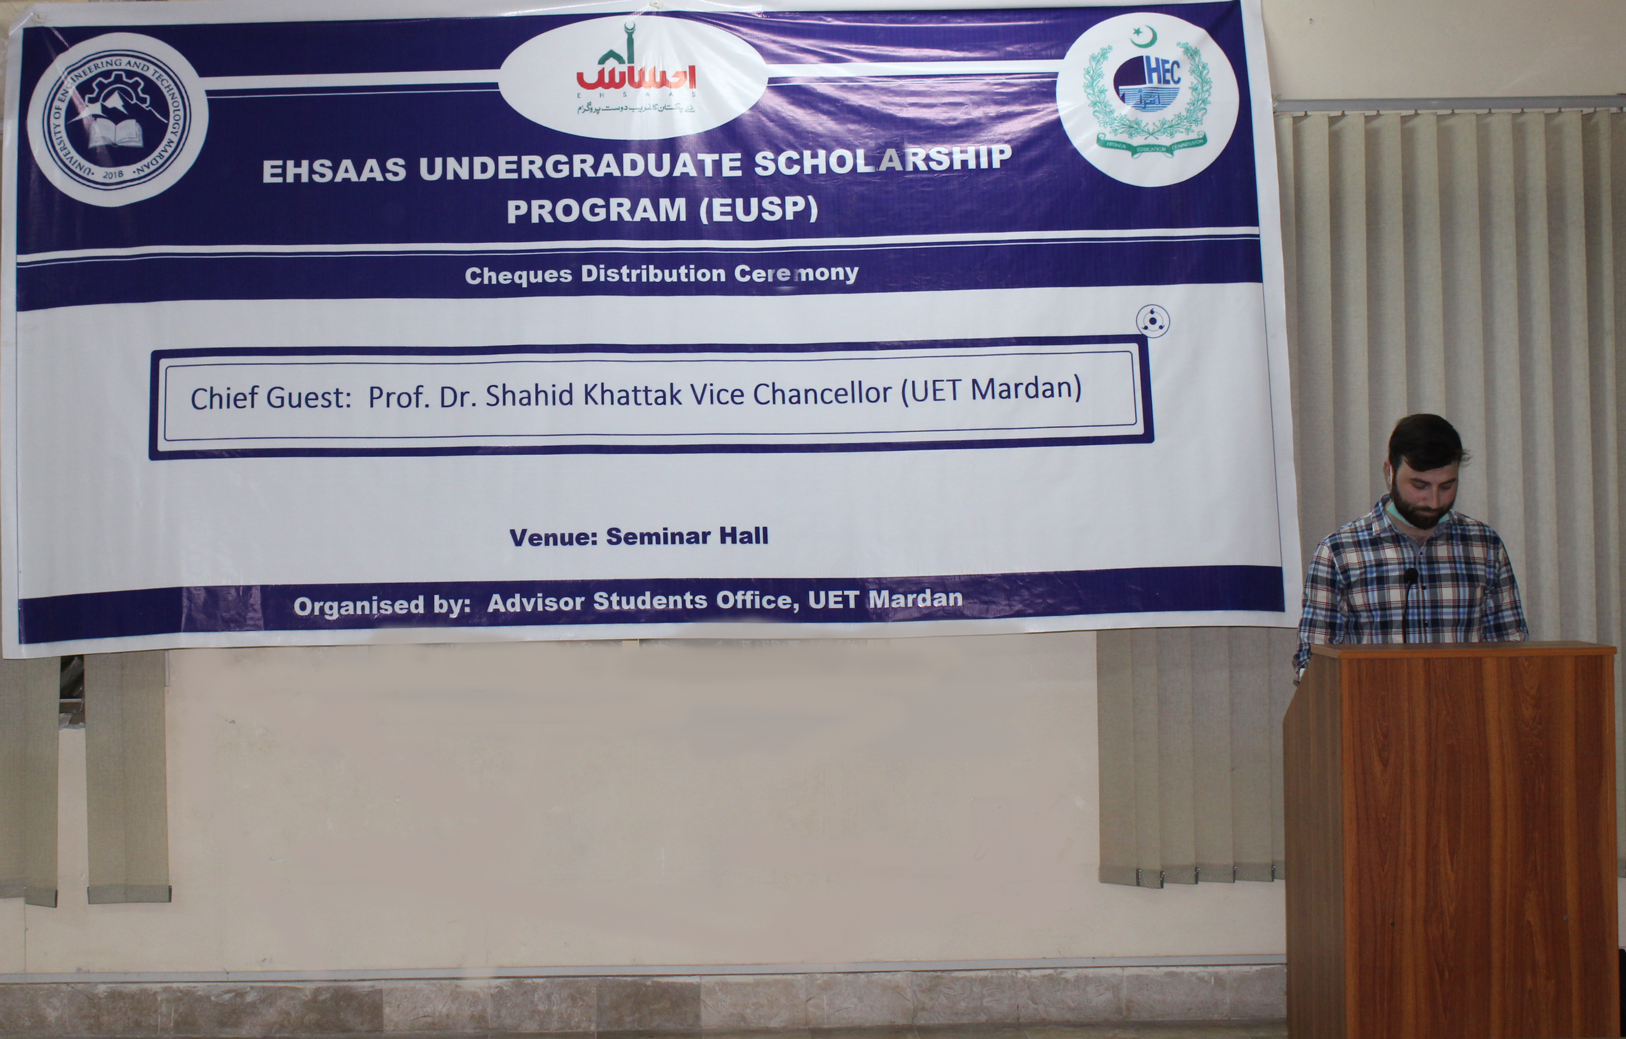 Ehsaas Undergraduate Scholarship Project